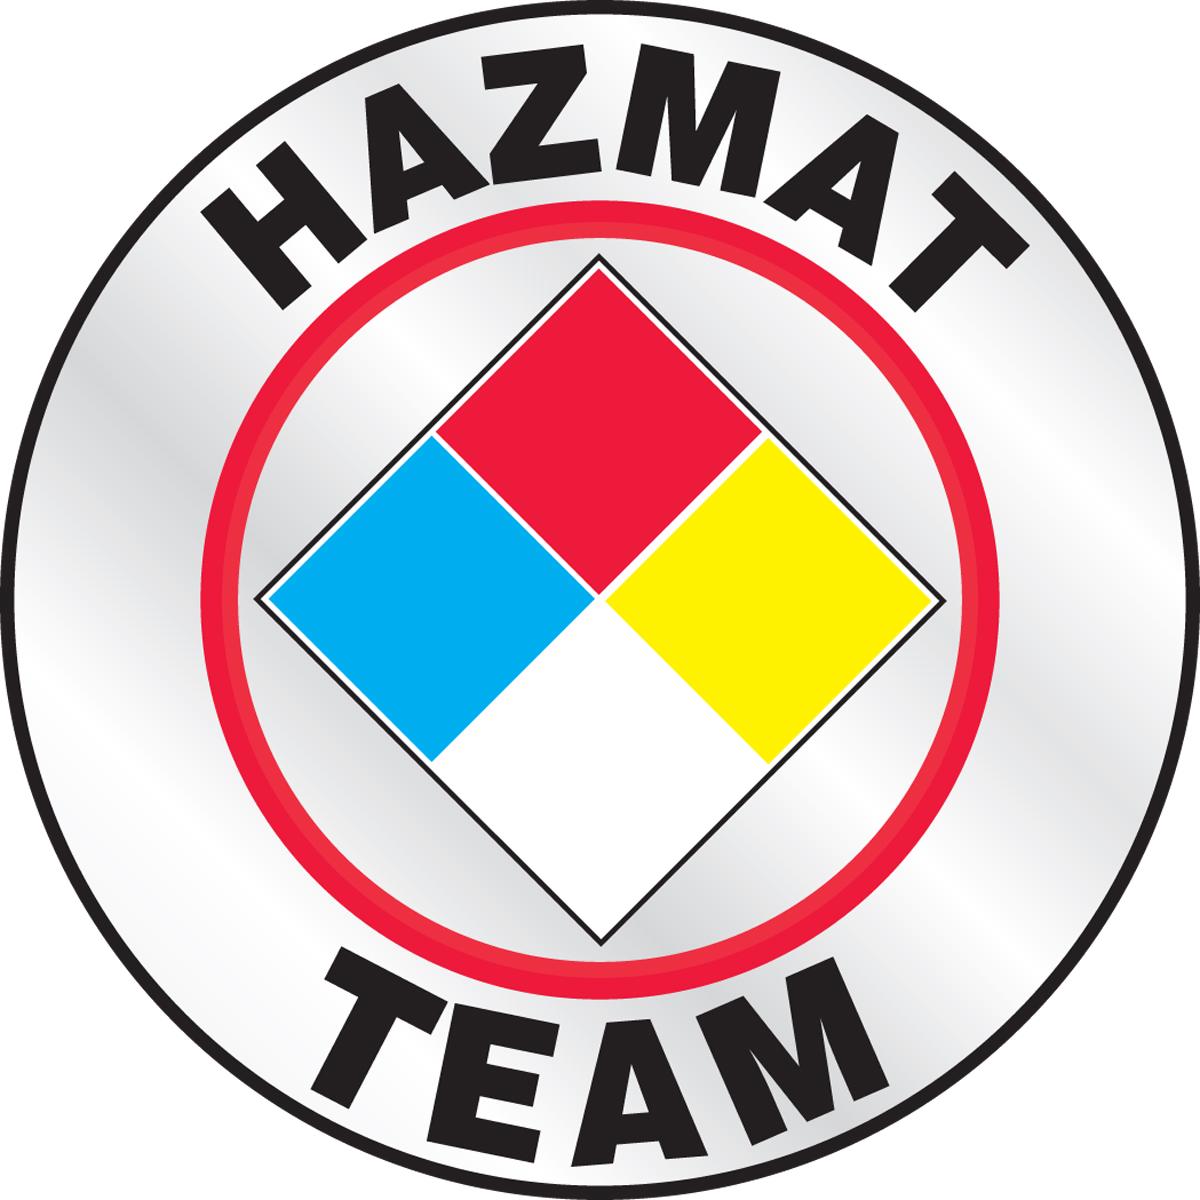 HAZMAT TEAM